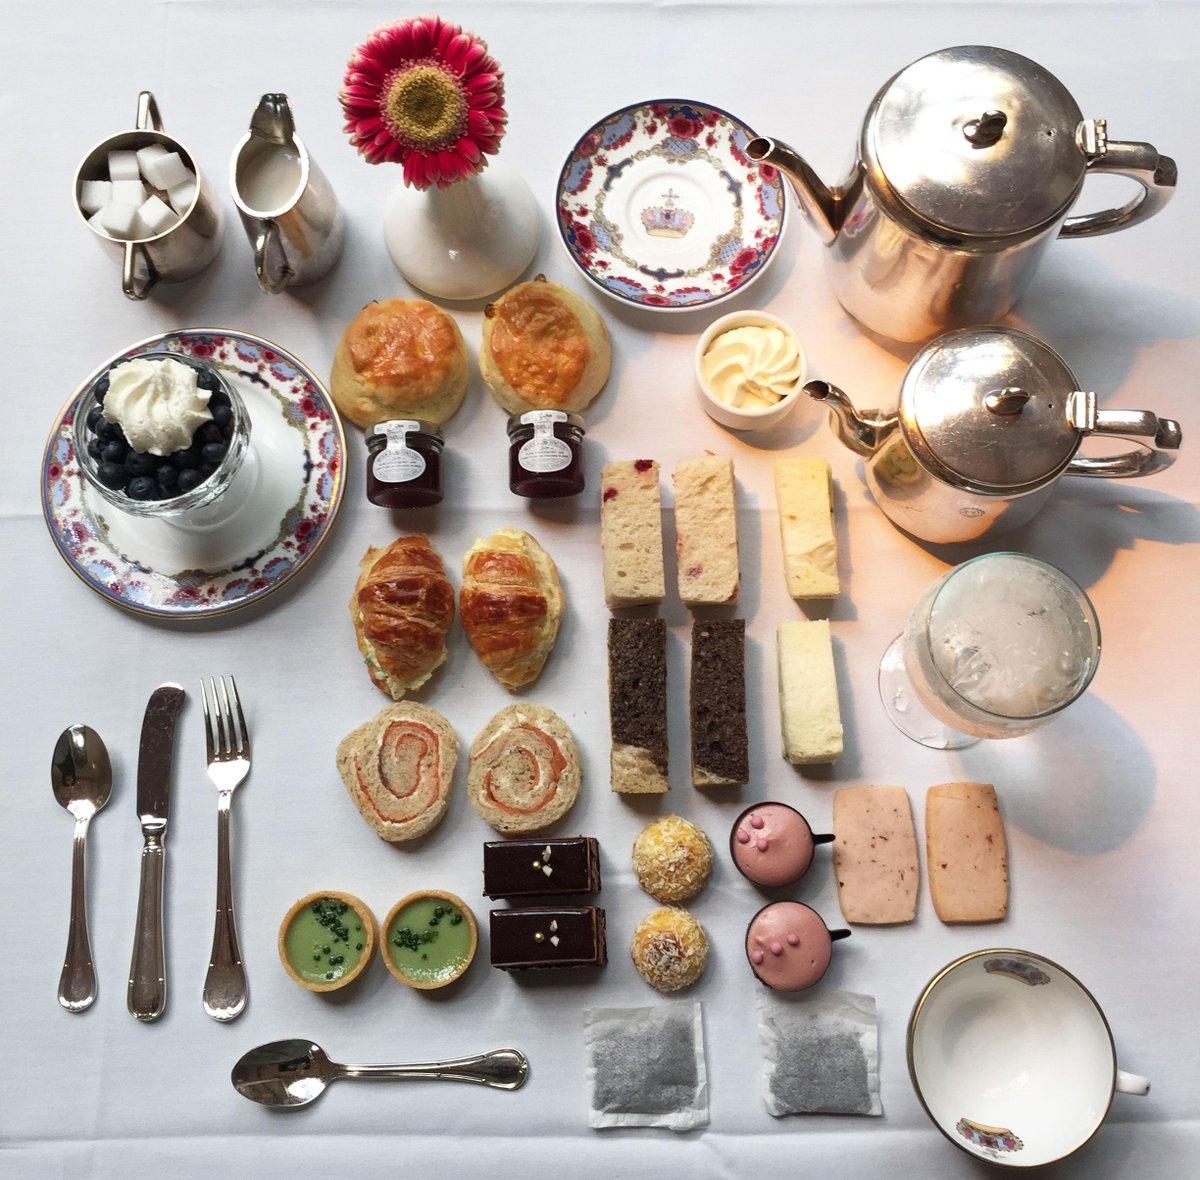 Afternoon Tea deconstructed. #FairmontHotels #FairmontEmpress #afternoontea #Fairmont #yyj #tea #victoriabc #empress http://t.co/swxWwaJsnk